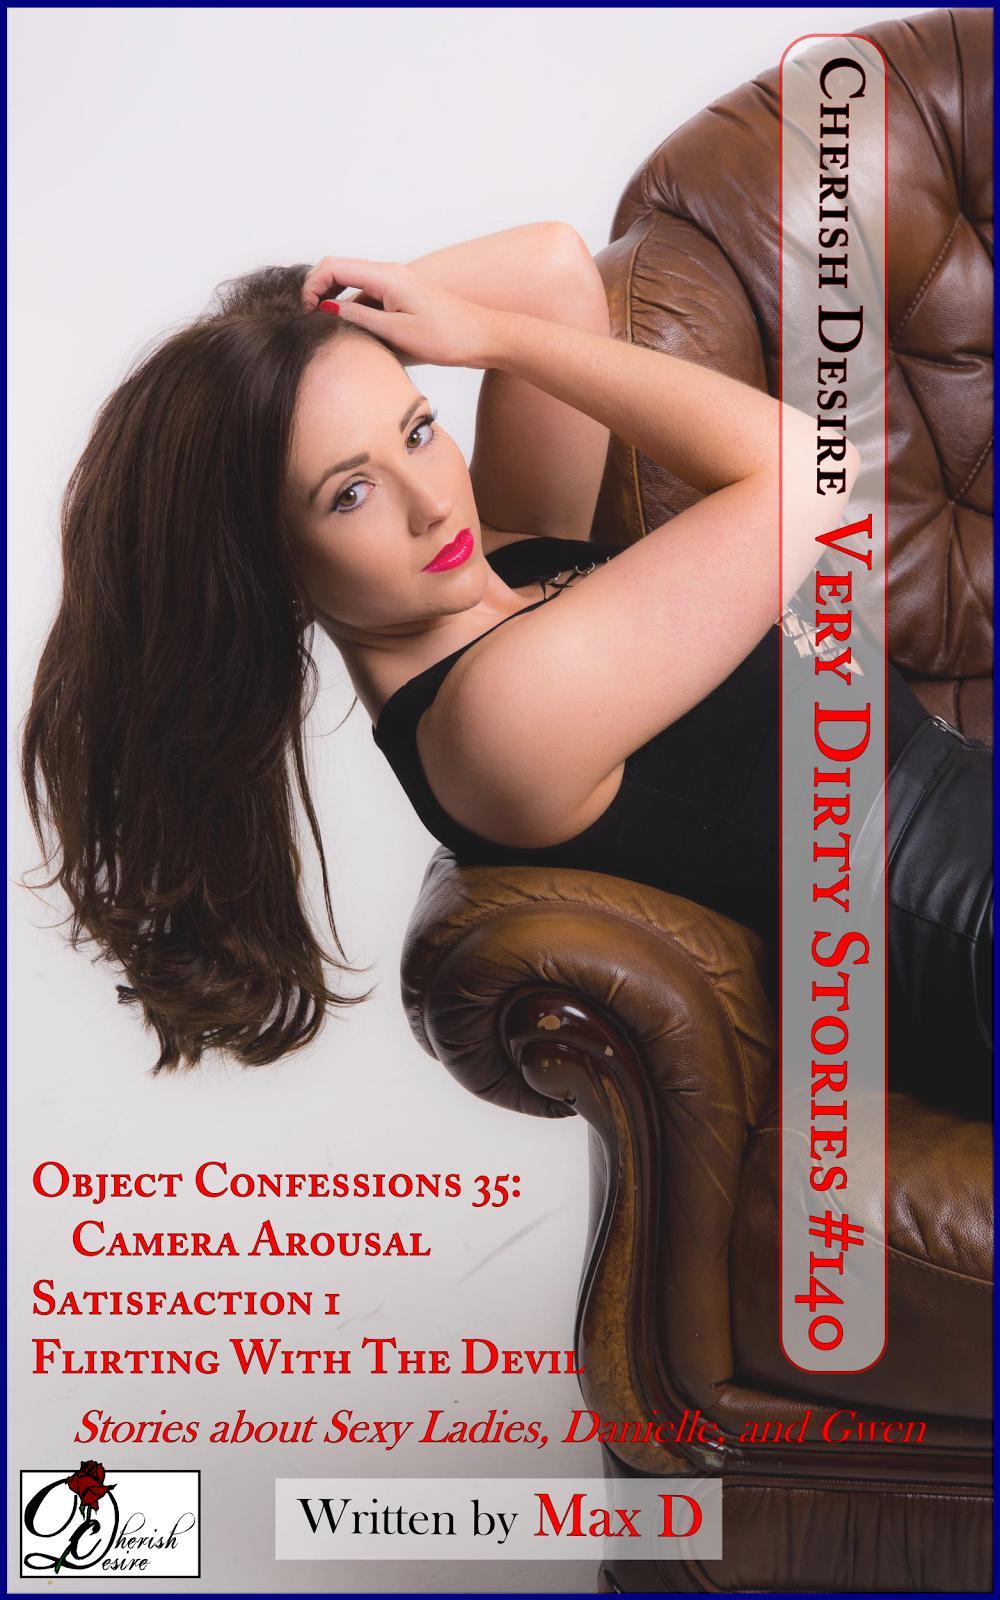 Cherish Desire: Very Dirty Stories #140, Max D, erotica